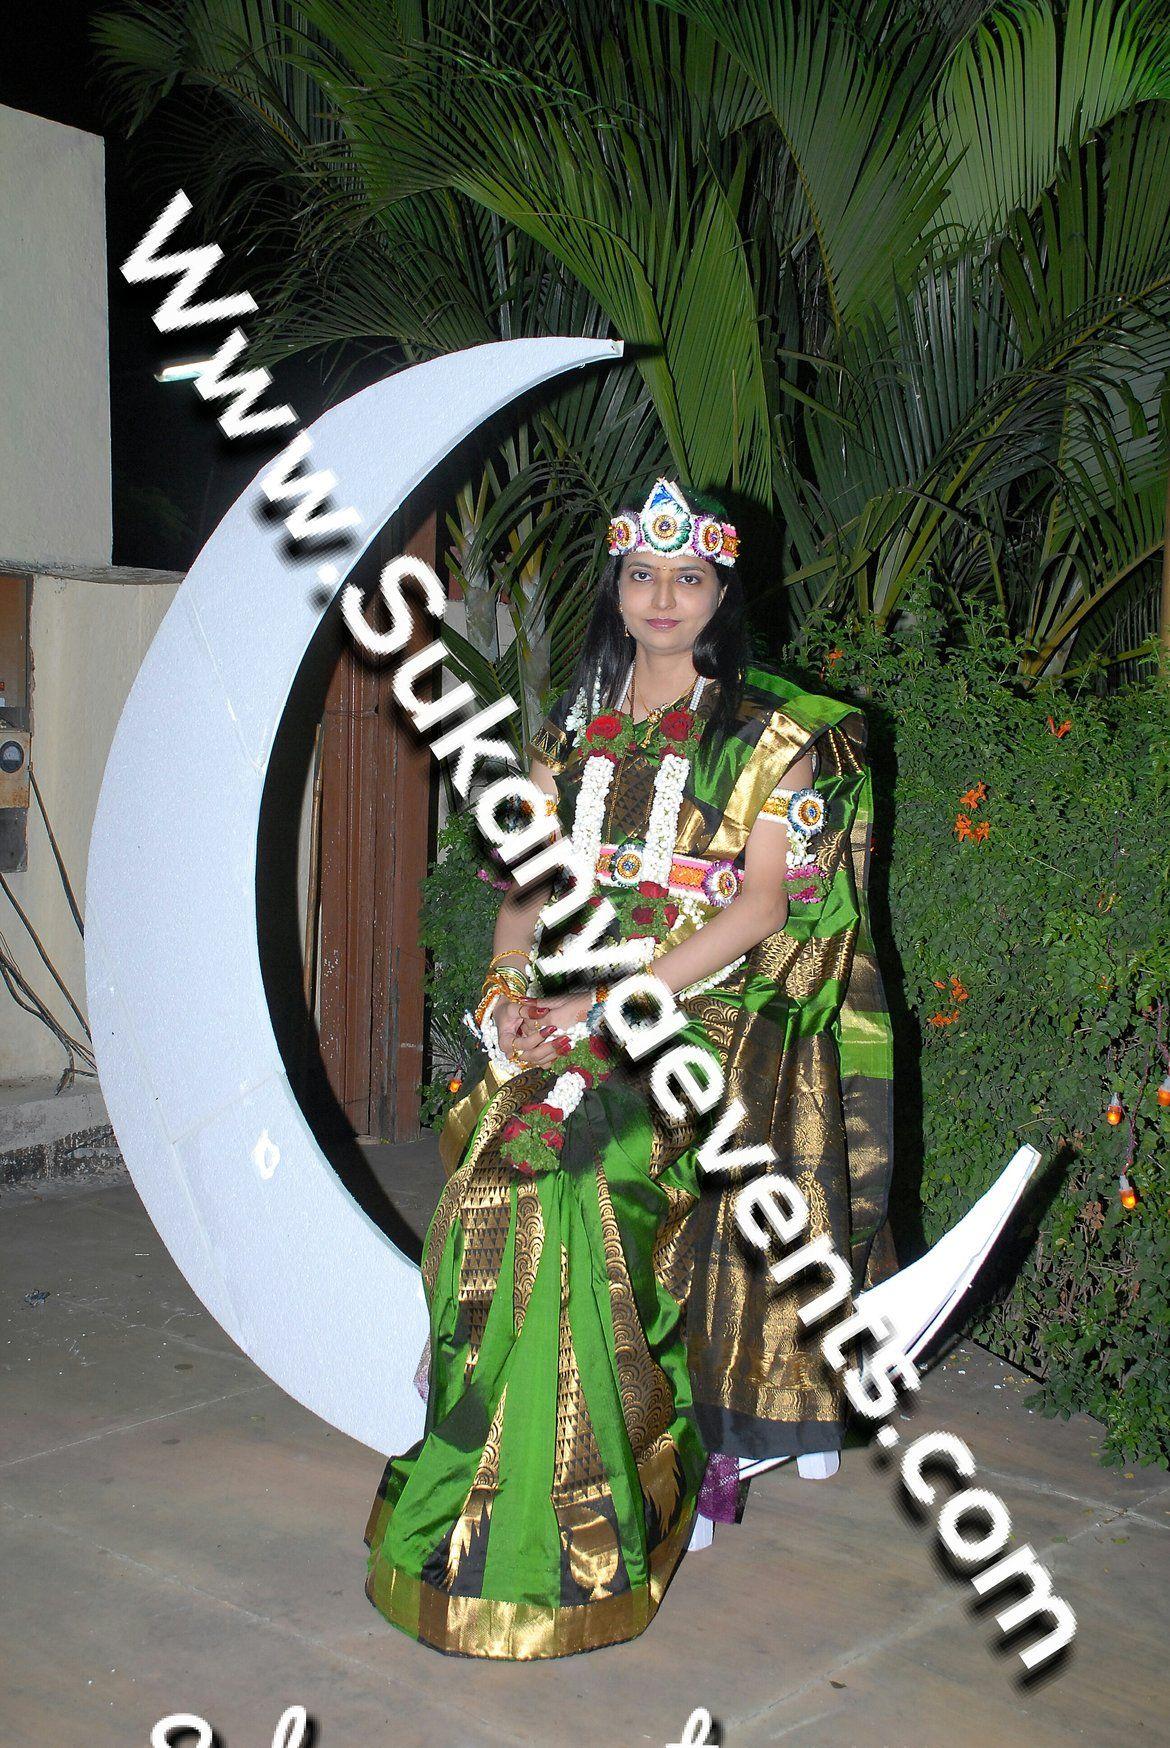 Dohale jevan dohale jevan pinterest wedding background dohale jevan stopboris Images